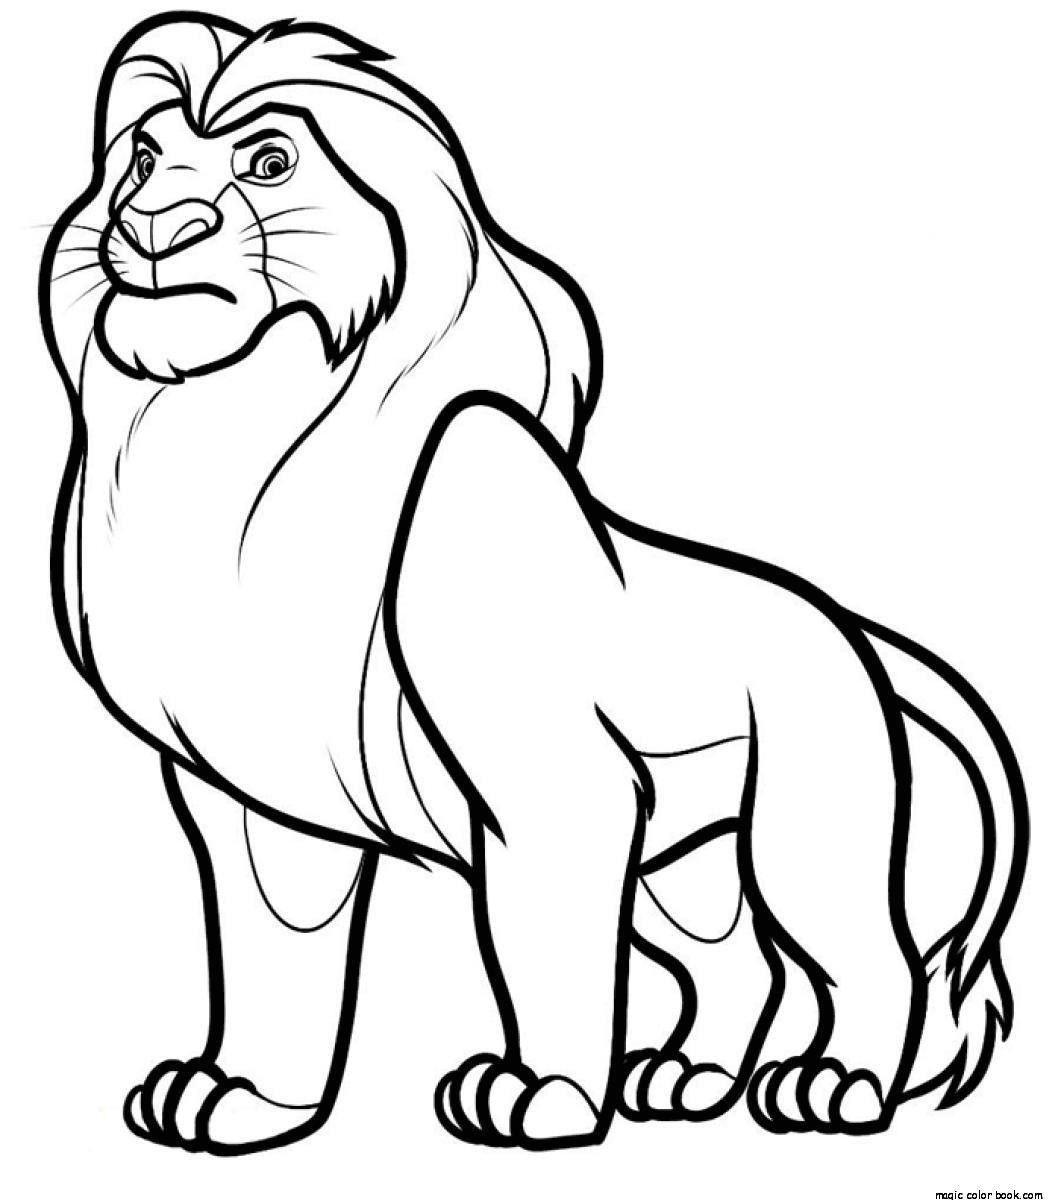 24 Brilliant Image Of Color Pages Online Davemelillo Com Lion Coloring Pages Disney Coloring Pages Disney Colors